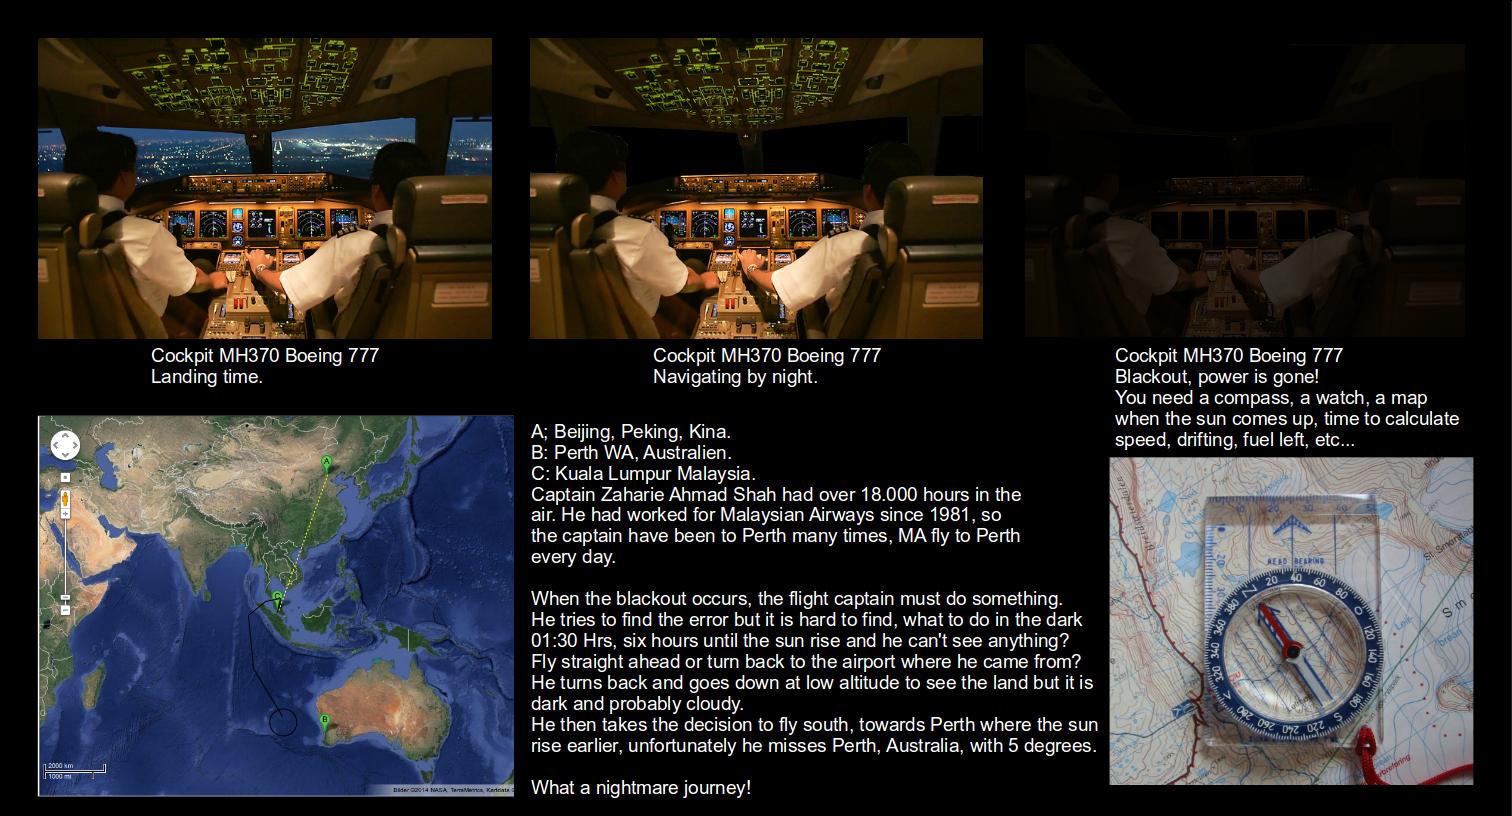 MH370, Boeing 777-200ER, blackout, accident.